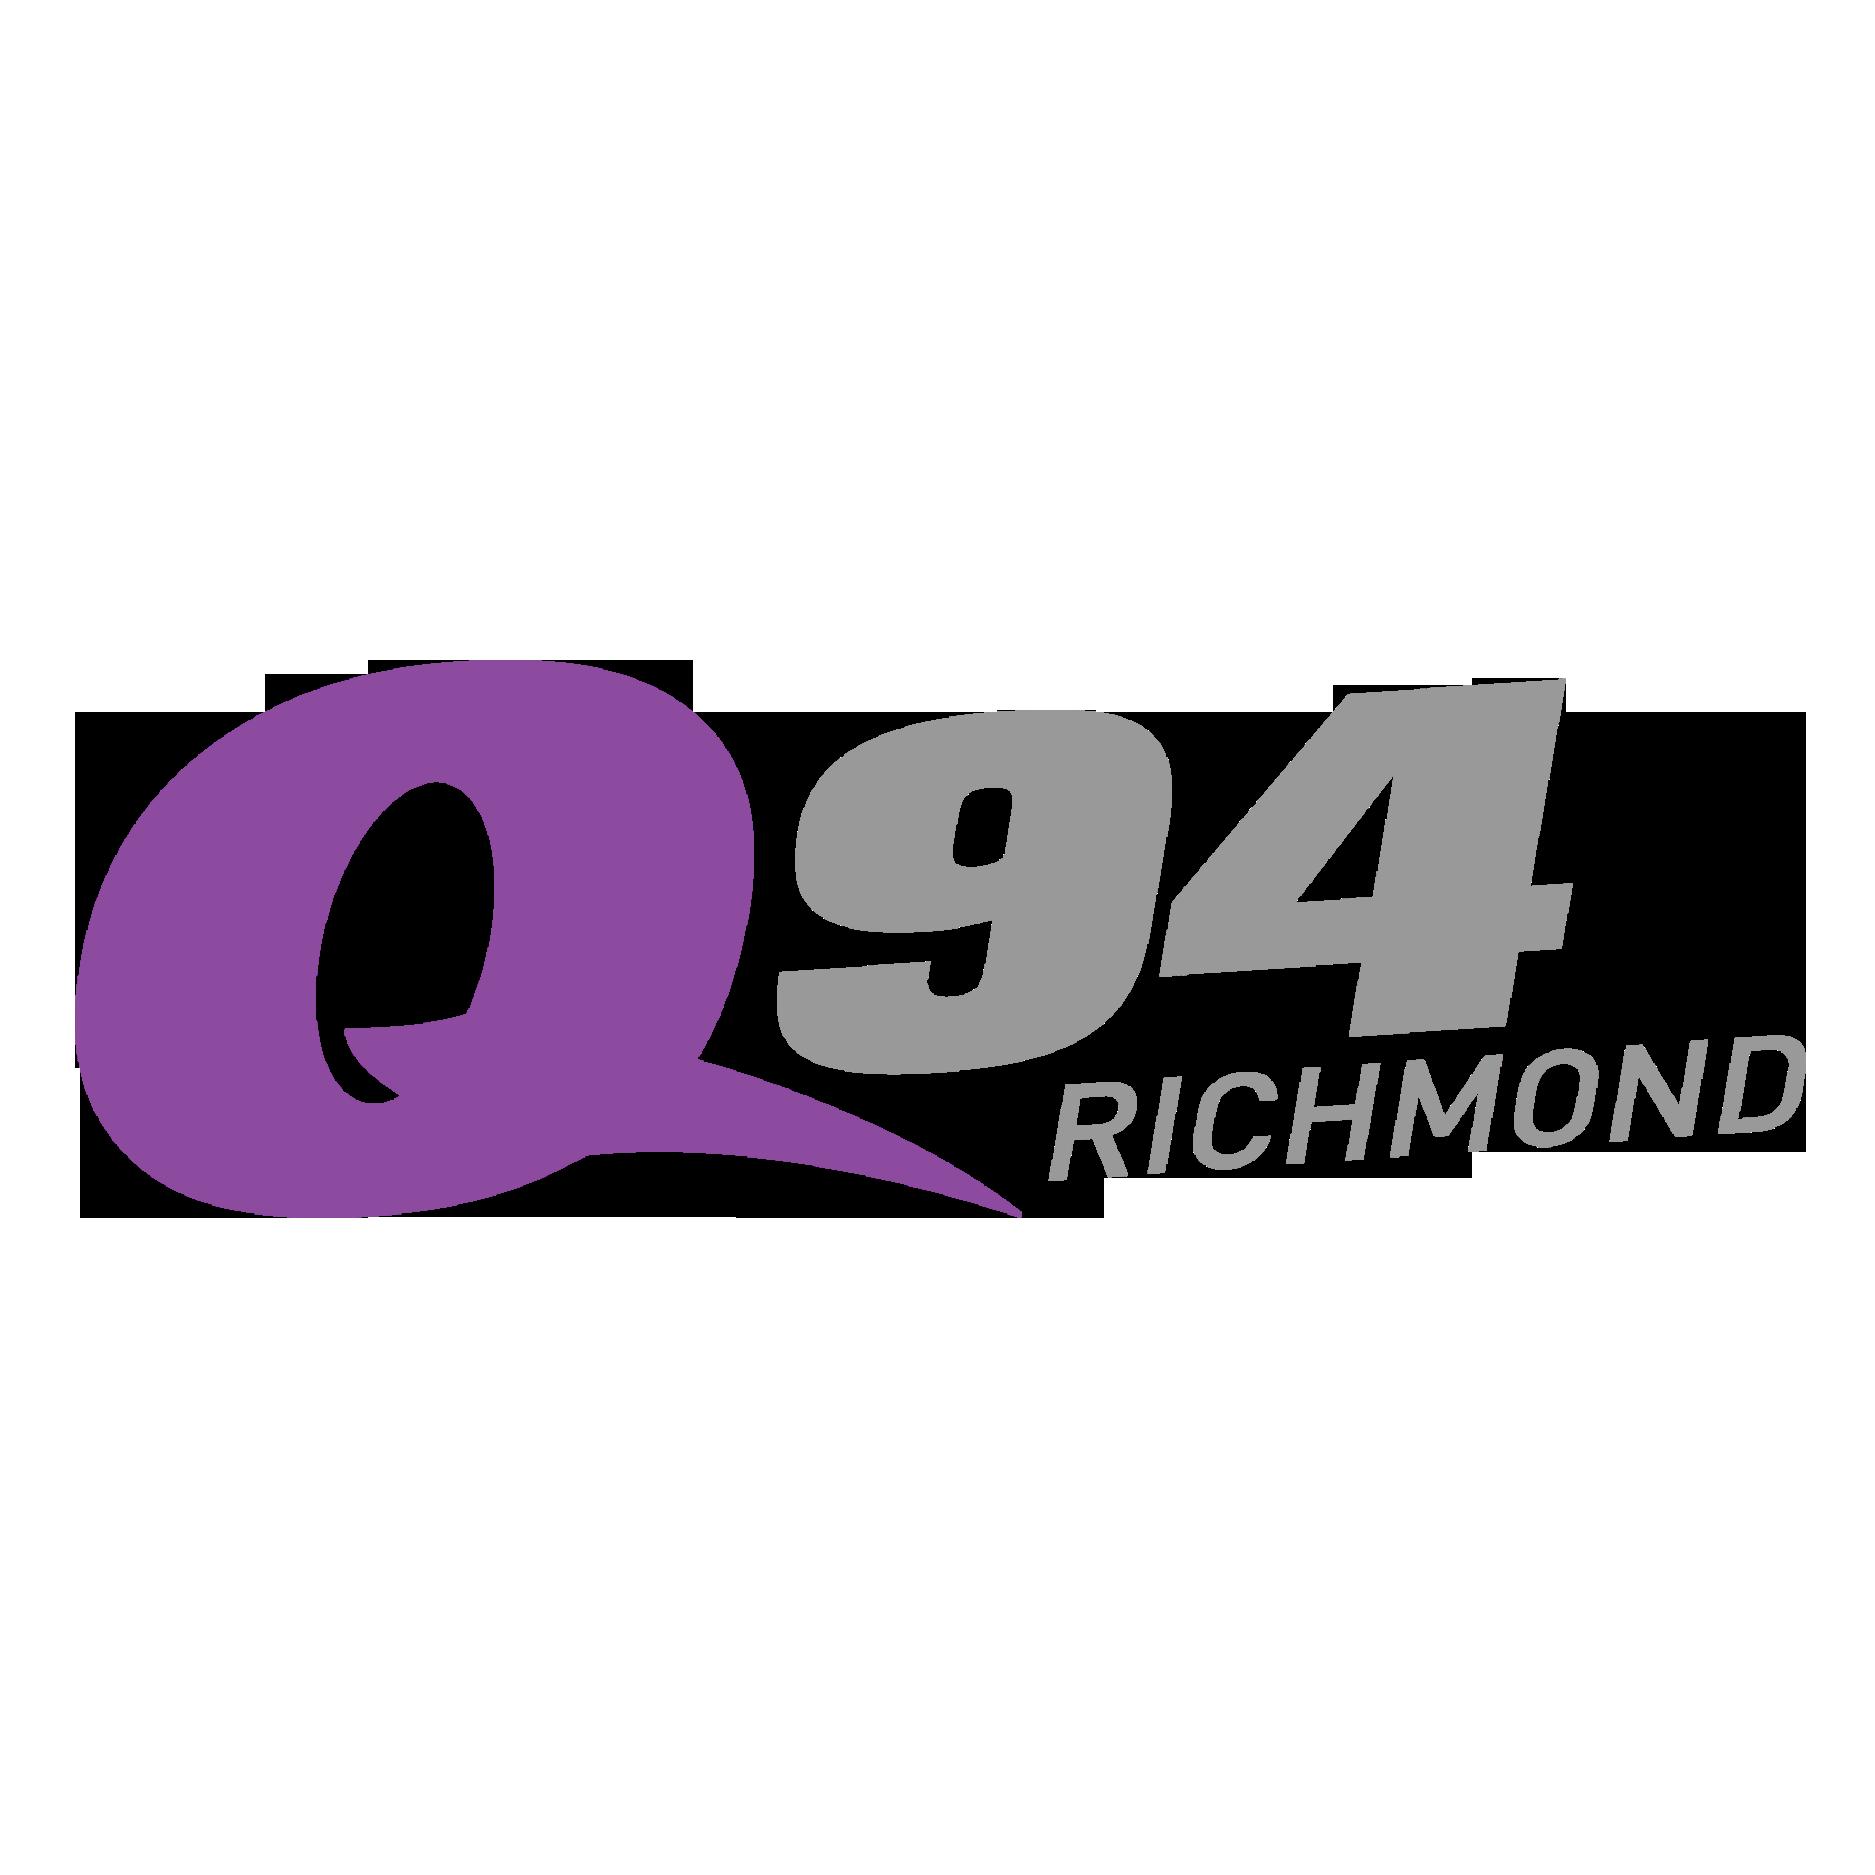 Listen to Q94 Live - Richmond's #1 Hit Music Station